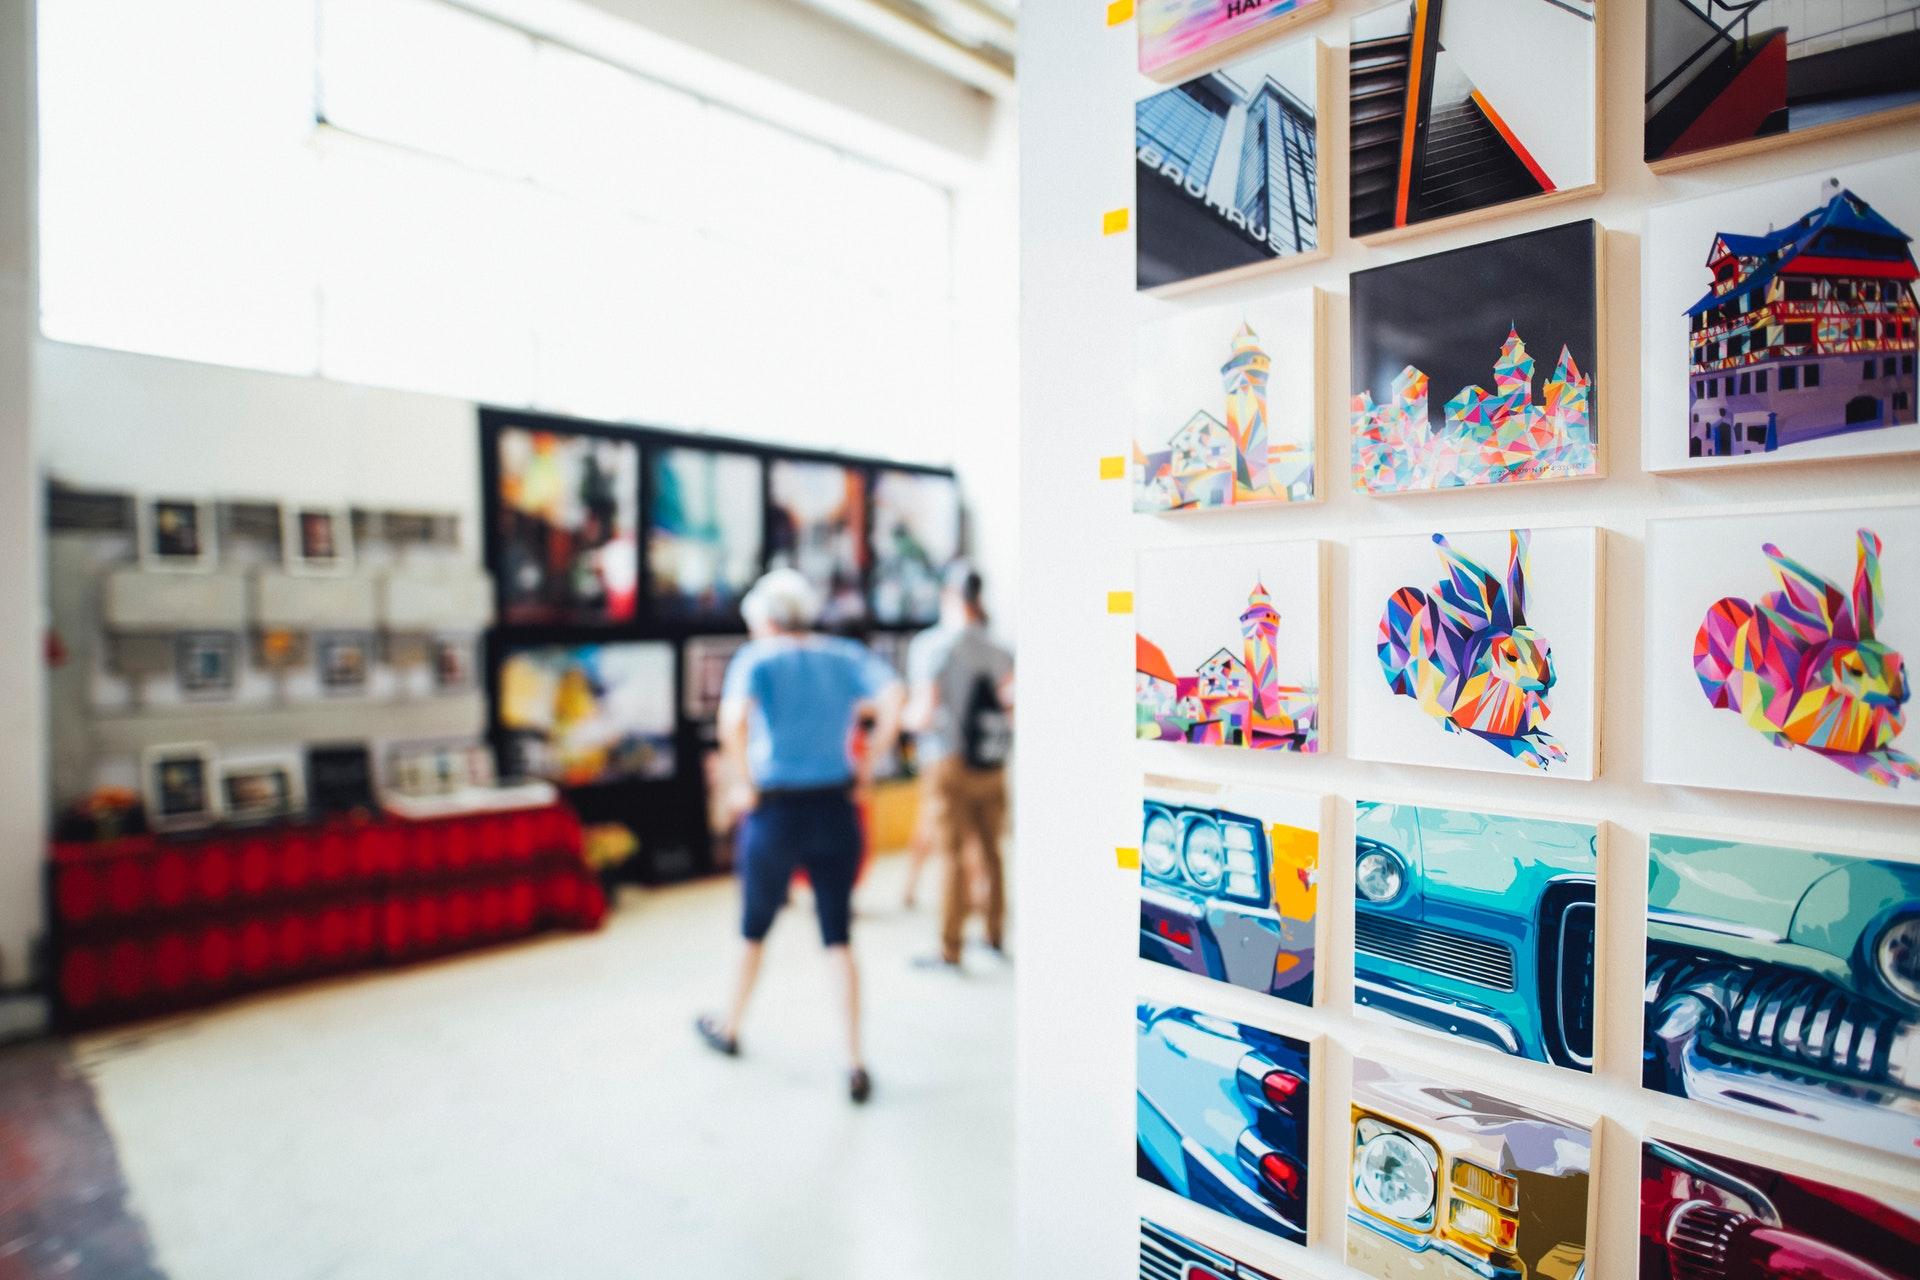 art-art-exhibition-art-gallery-2559741